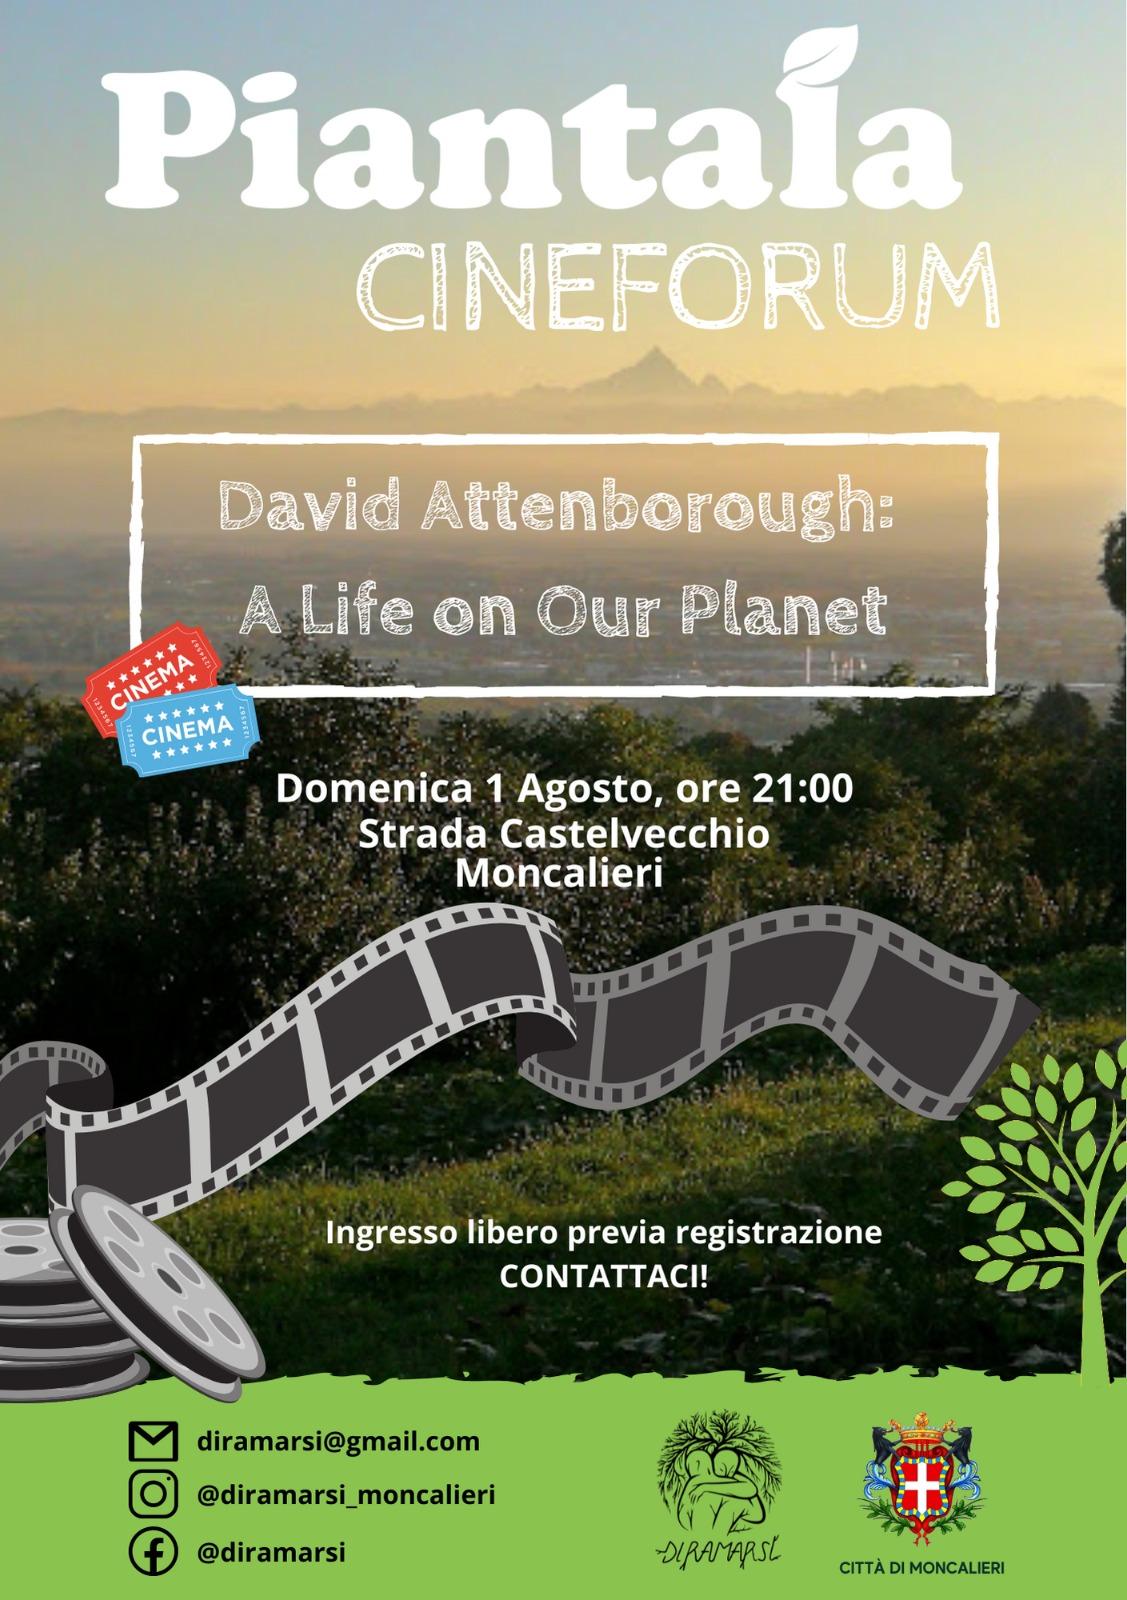 CineForum: Life on Our Planet - David Attenborough